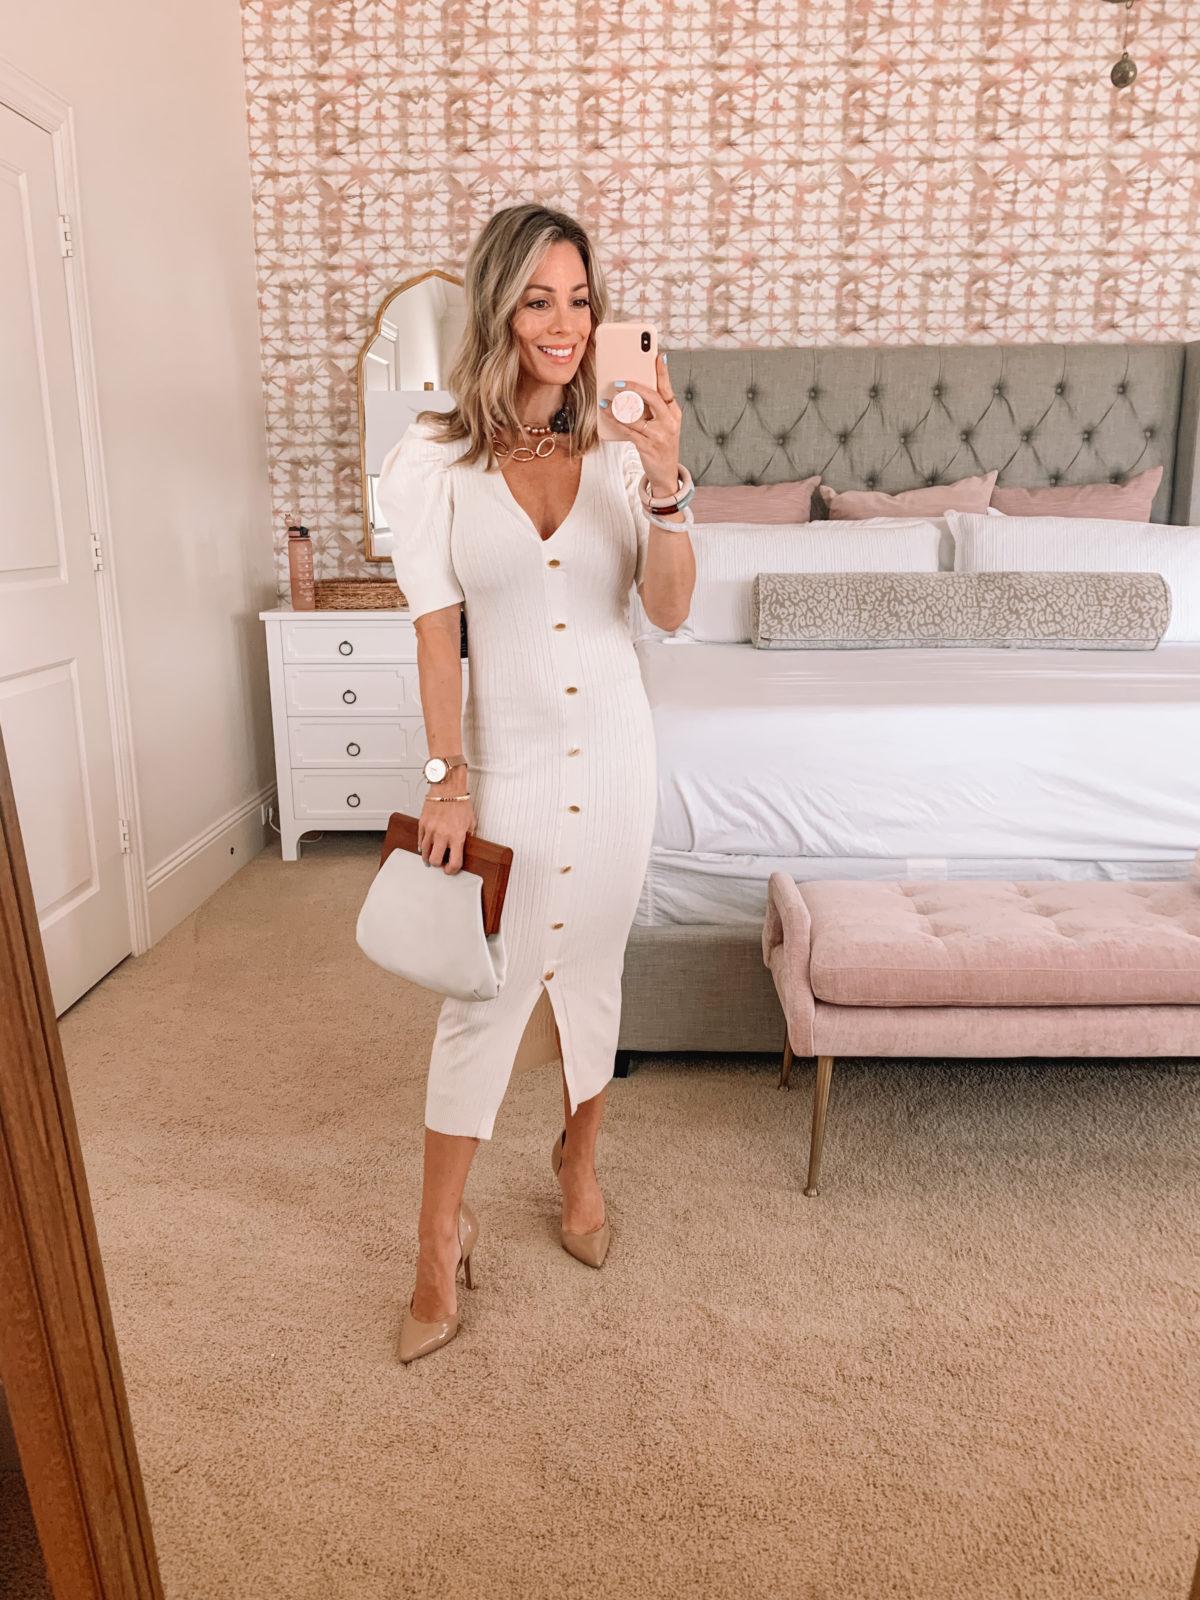 Dressing Room Finds, Body Con Dress, Clutch, Heels